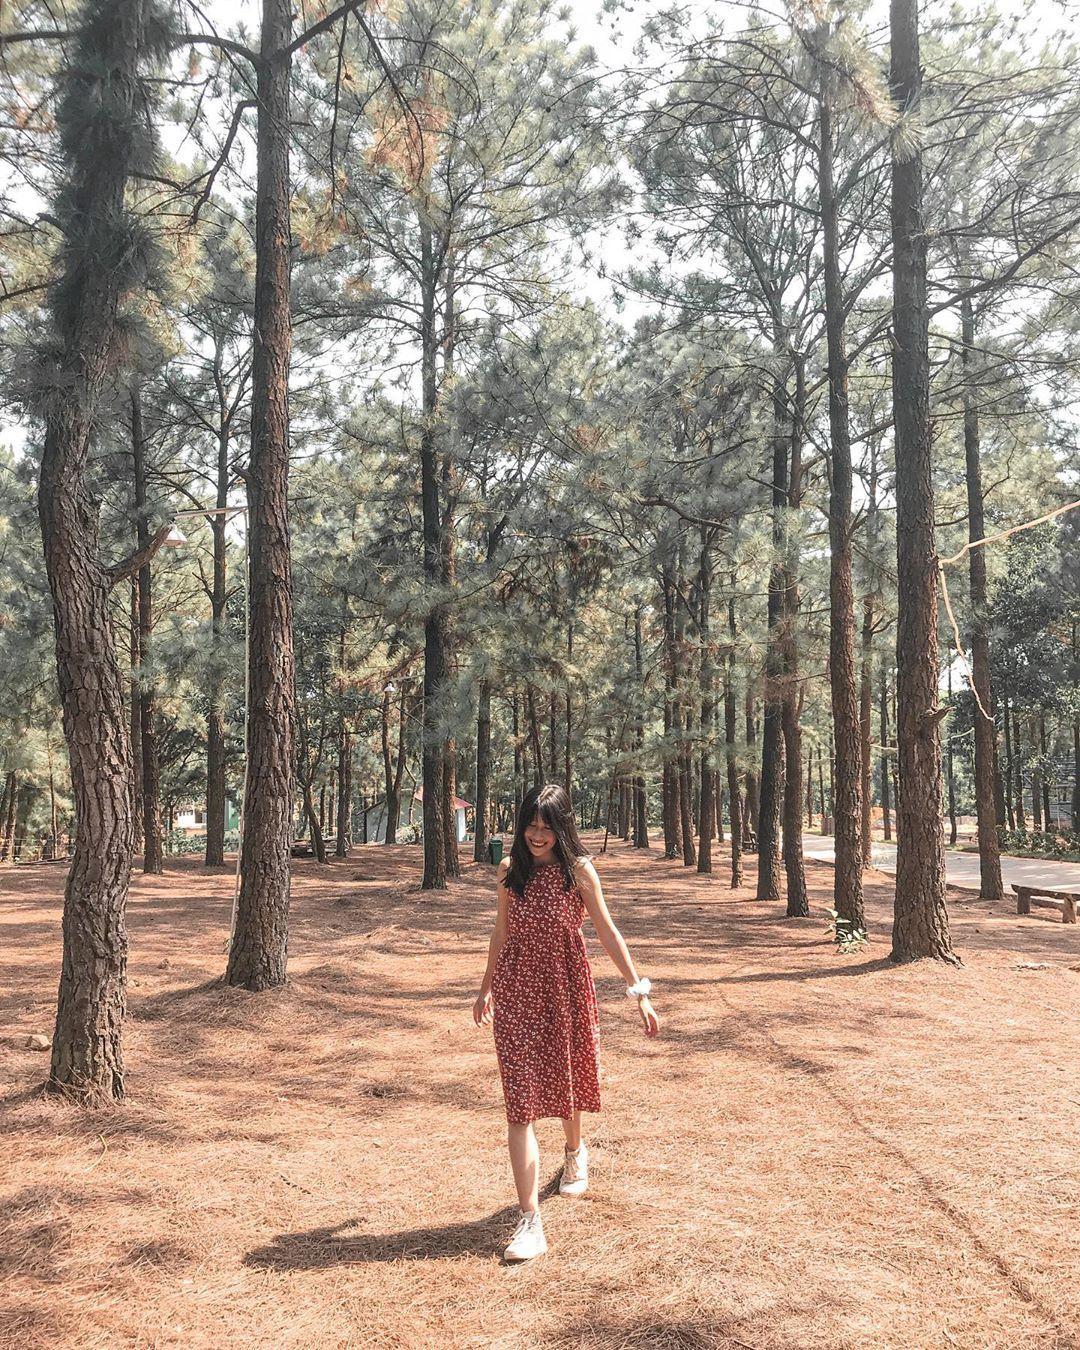 Sun is alone too, but still shine 😊 - - - - - #instadaily #instagram #instagood #instalike  #thanhxuân #thanhxuan #tha...